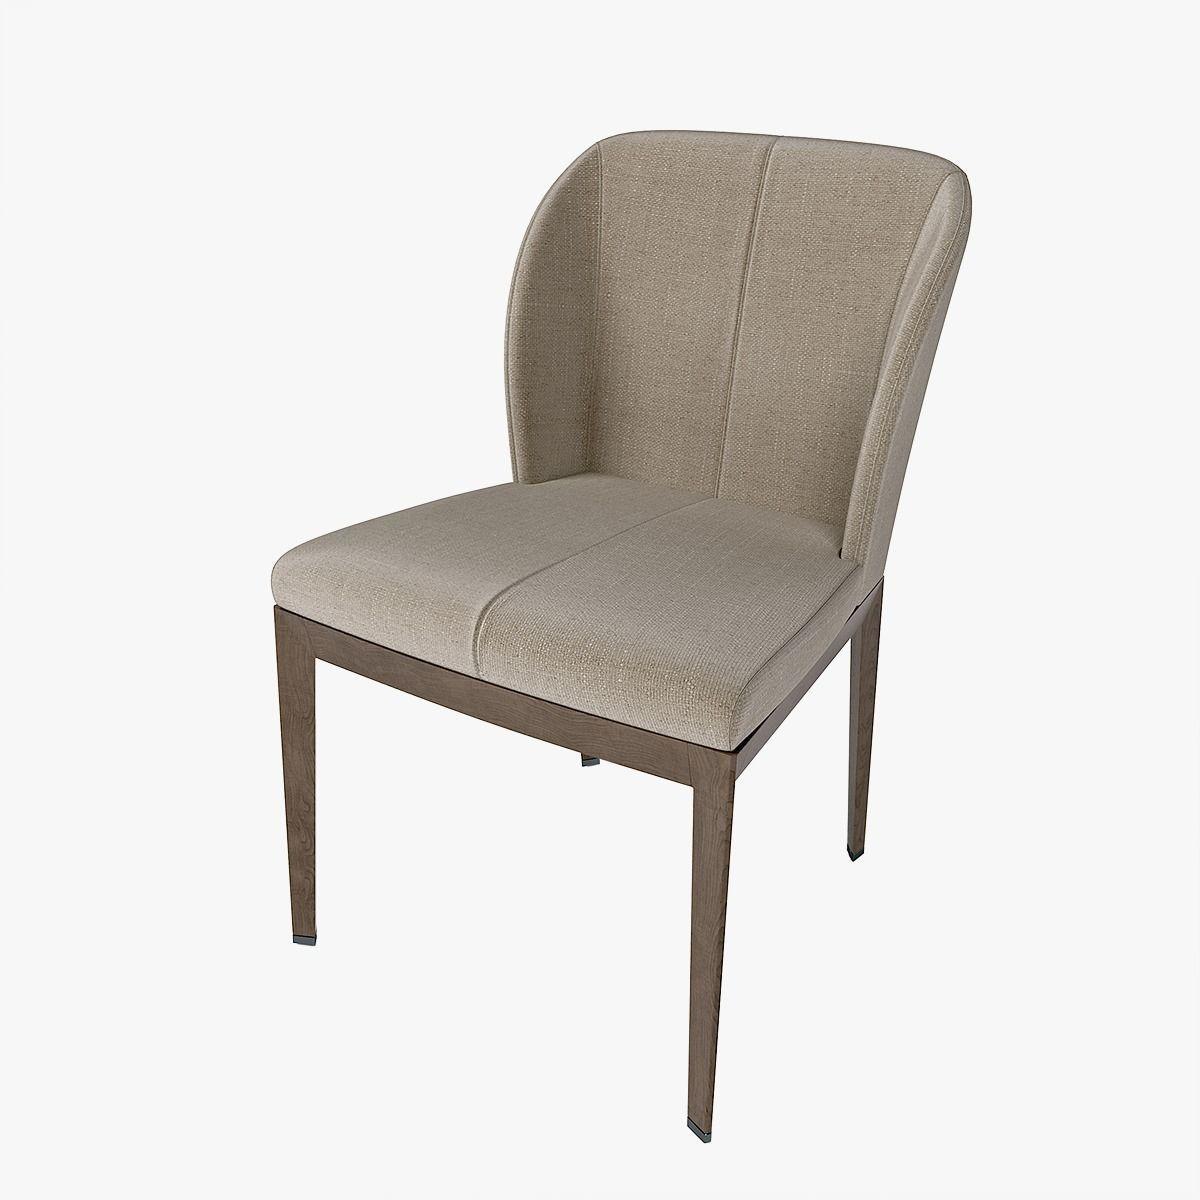 Giorgetti normal chair cloth